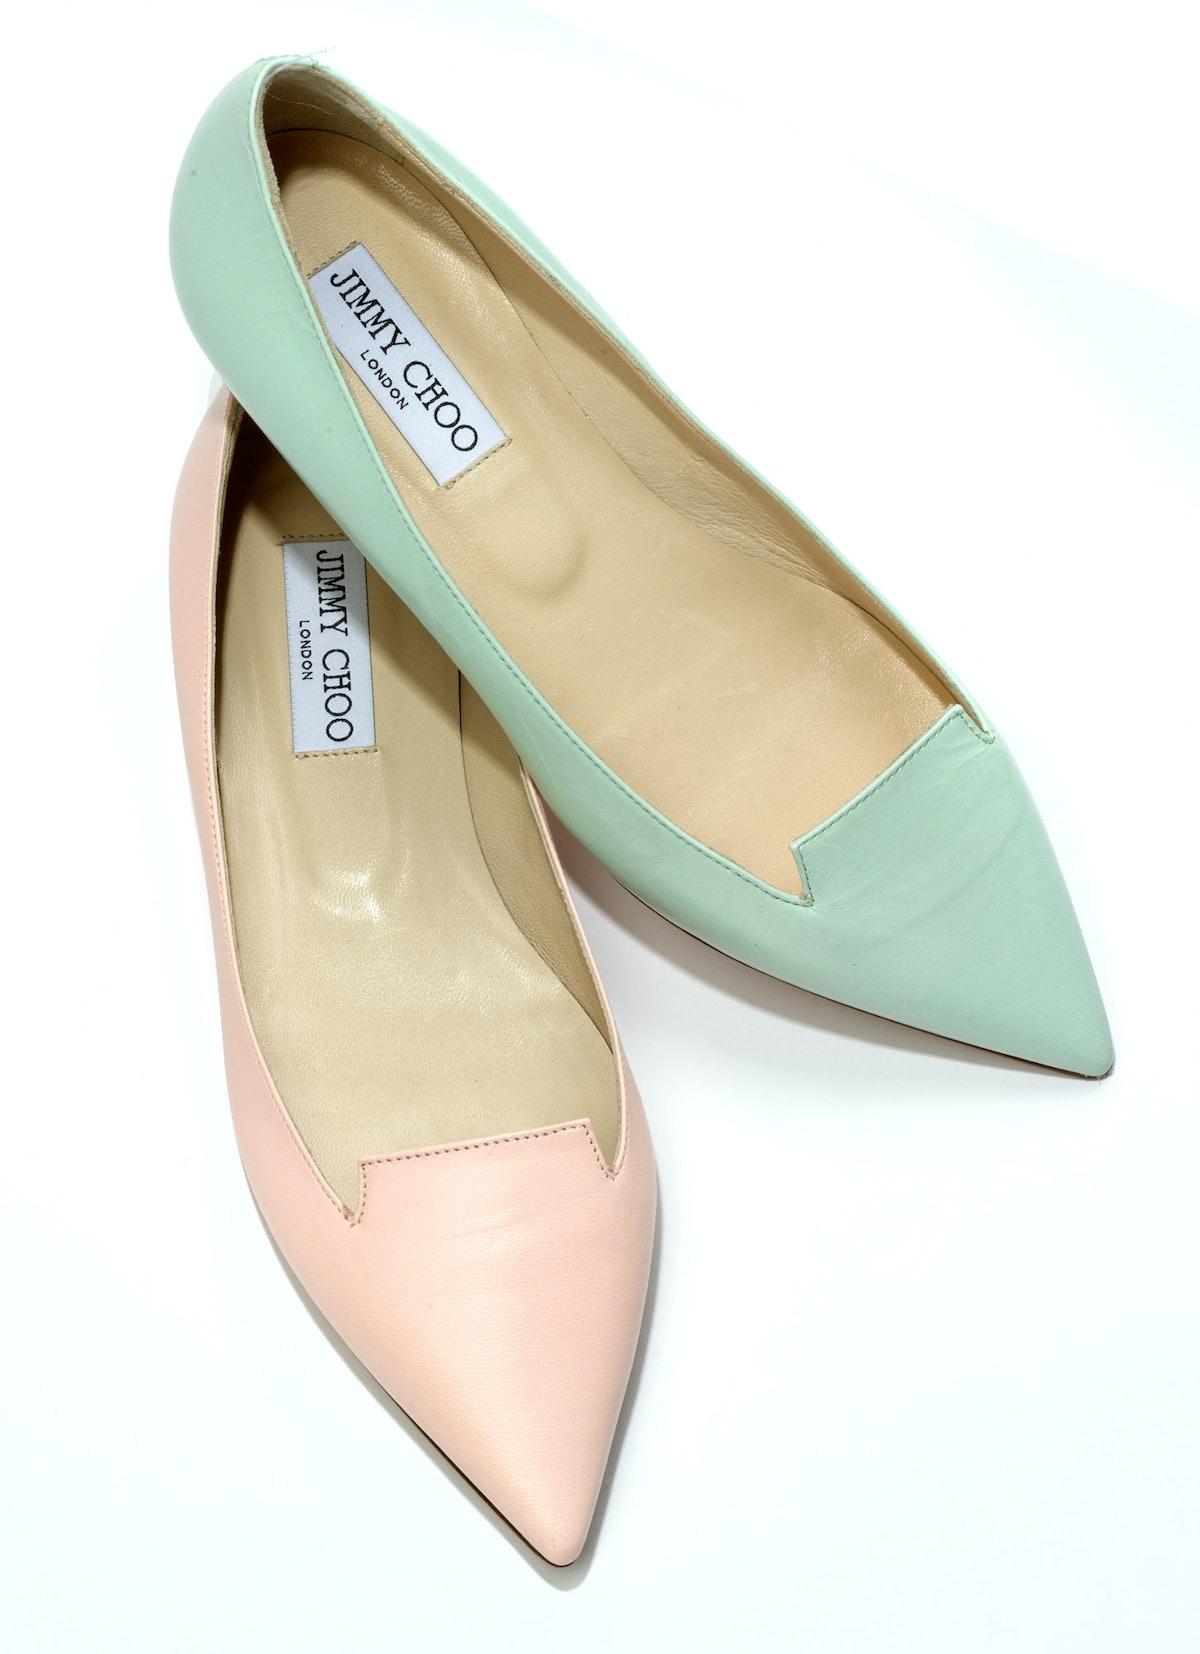 Jimmy Choo flats, $550 per pair, [nordstrom.com](http://rstyle.me/n/dwpty3w3n).